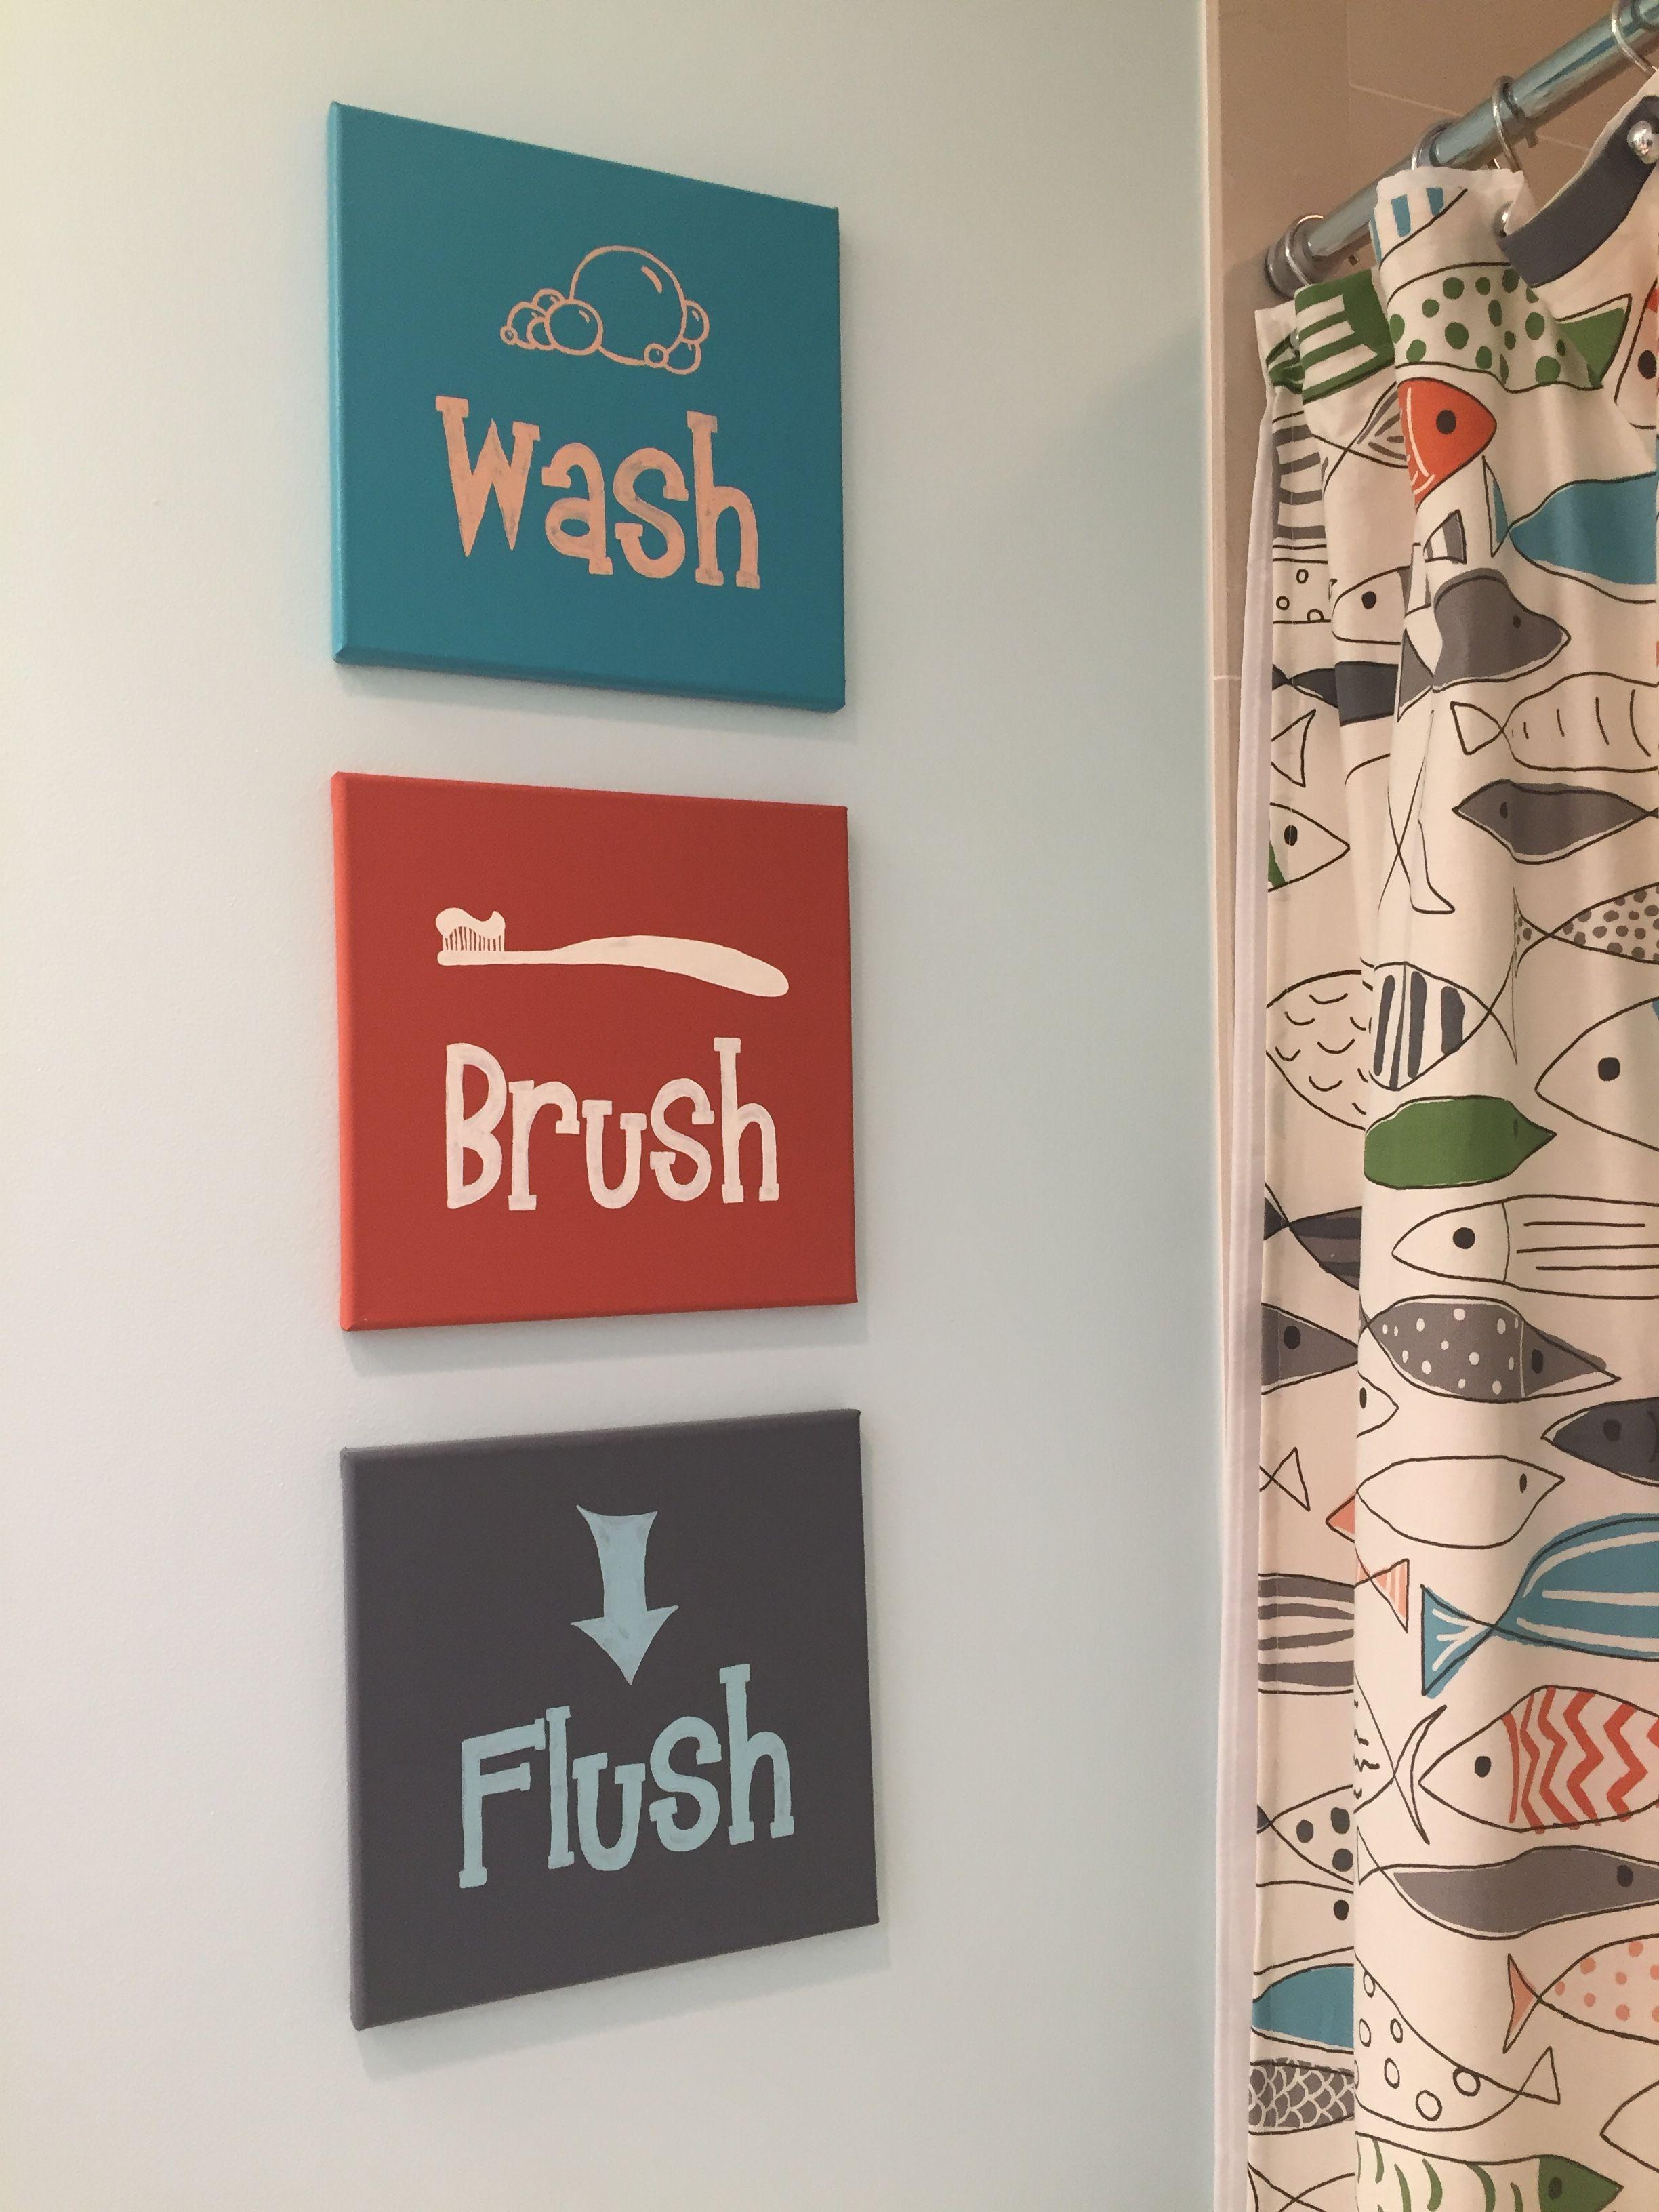 Kids Bathroom Artwork Wash Brush Flush 1 Paint Background Colors On Canvas 2 Use Pencil Rubbing Te Bathroom Canvas Art Bathroom Art Diy Diy Canvas Art